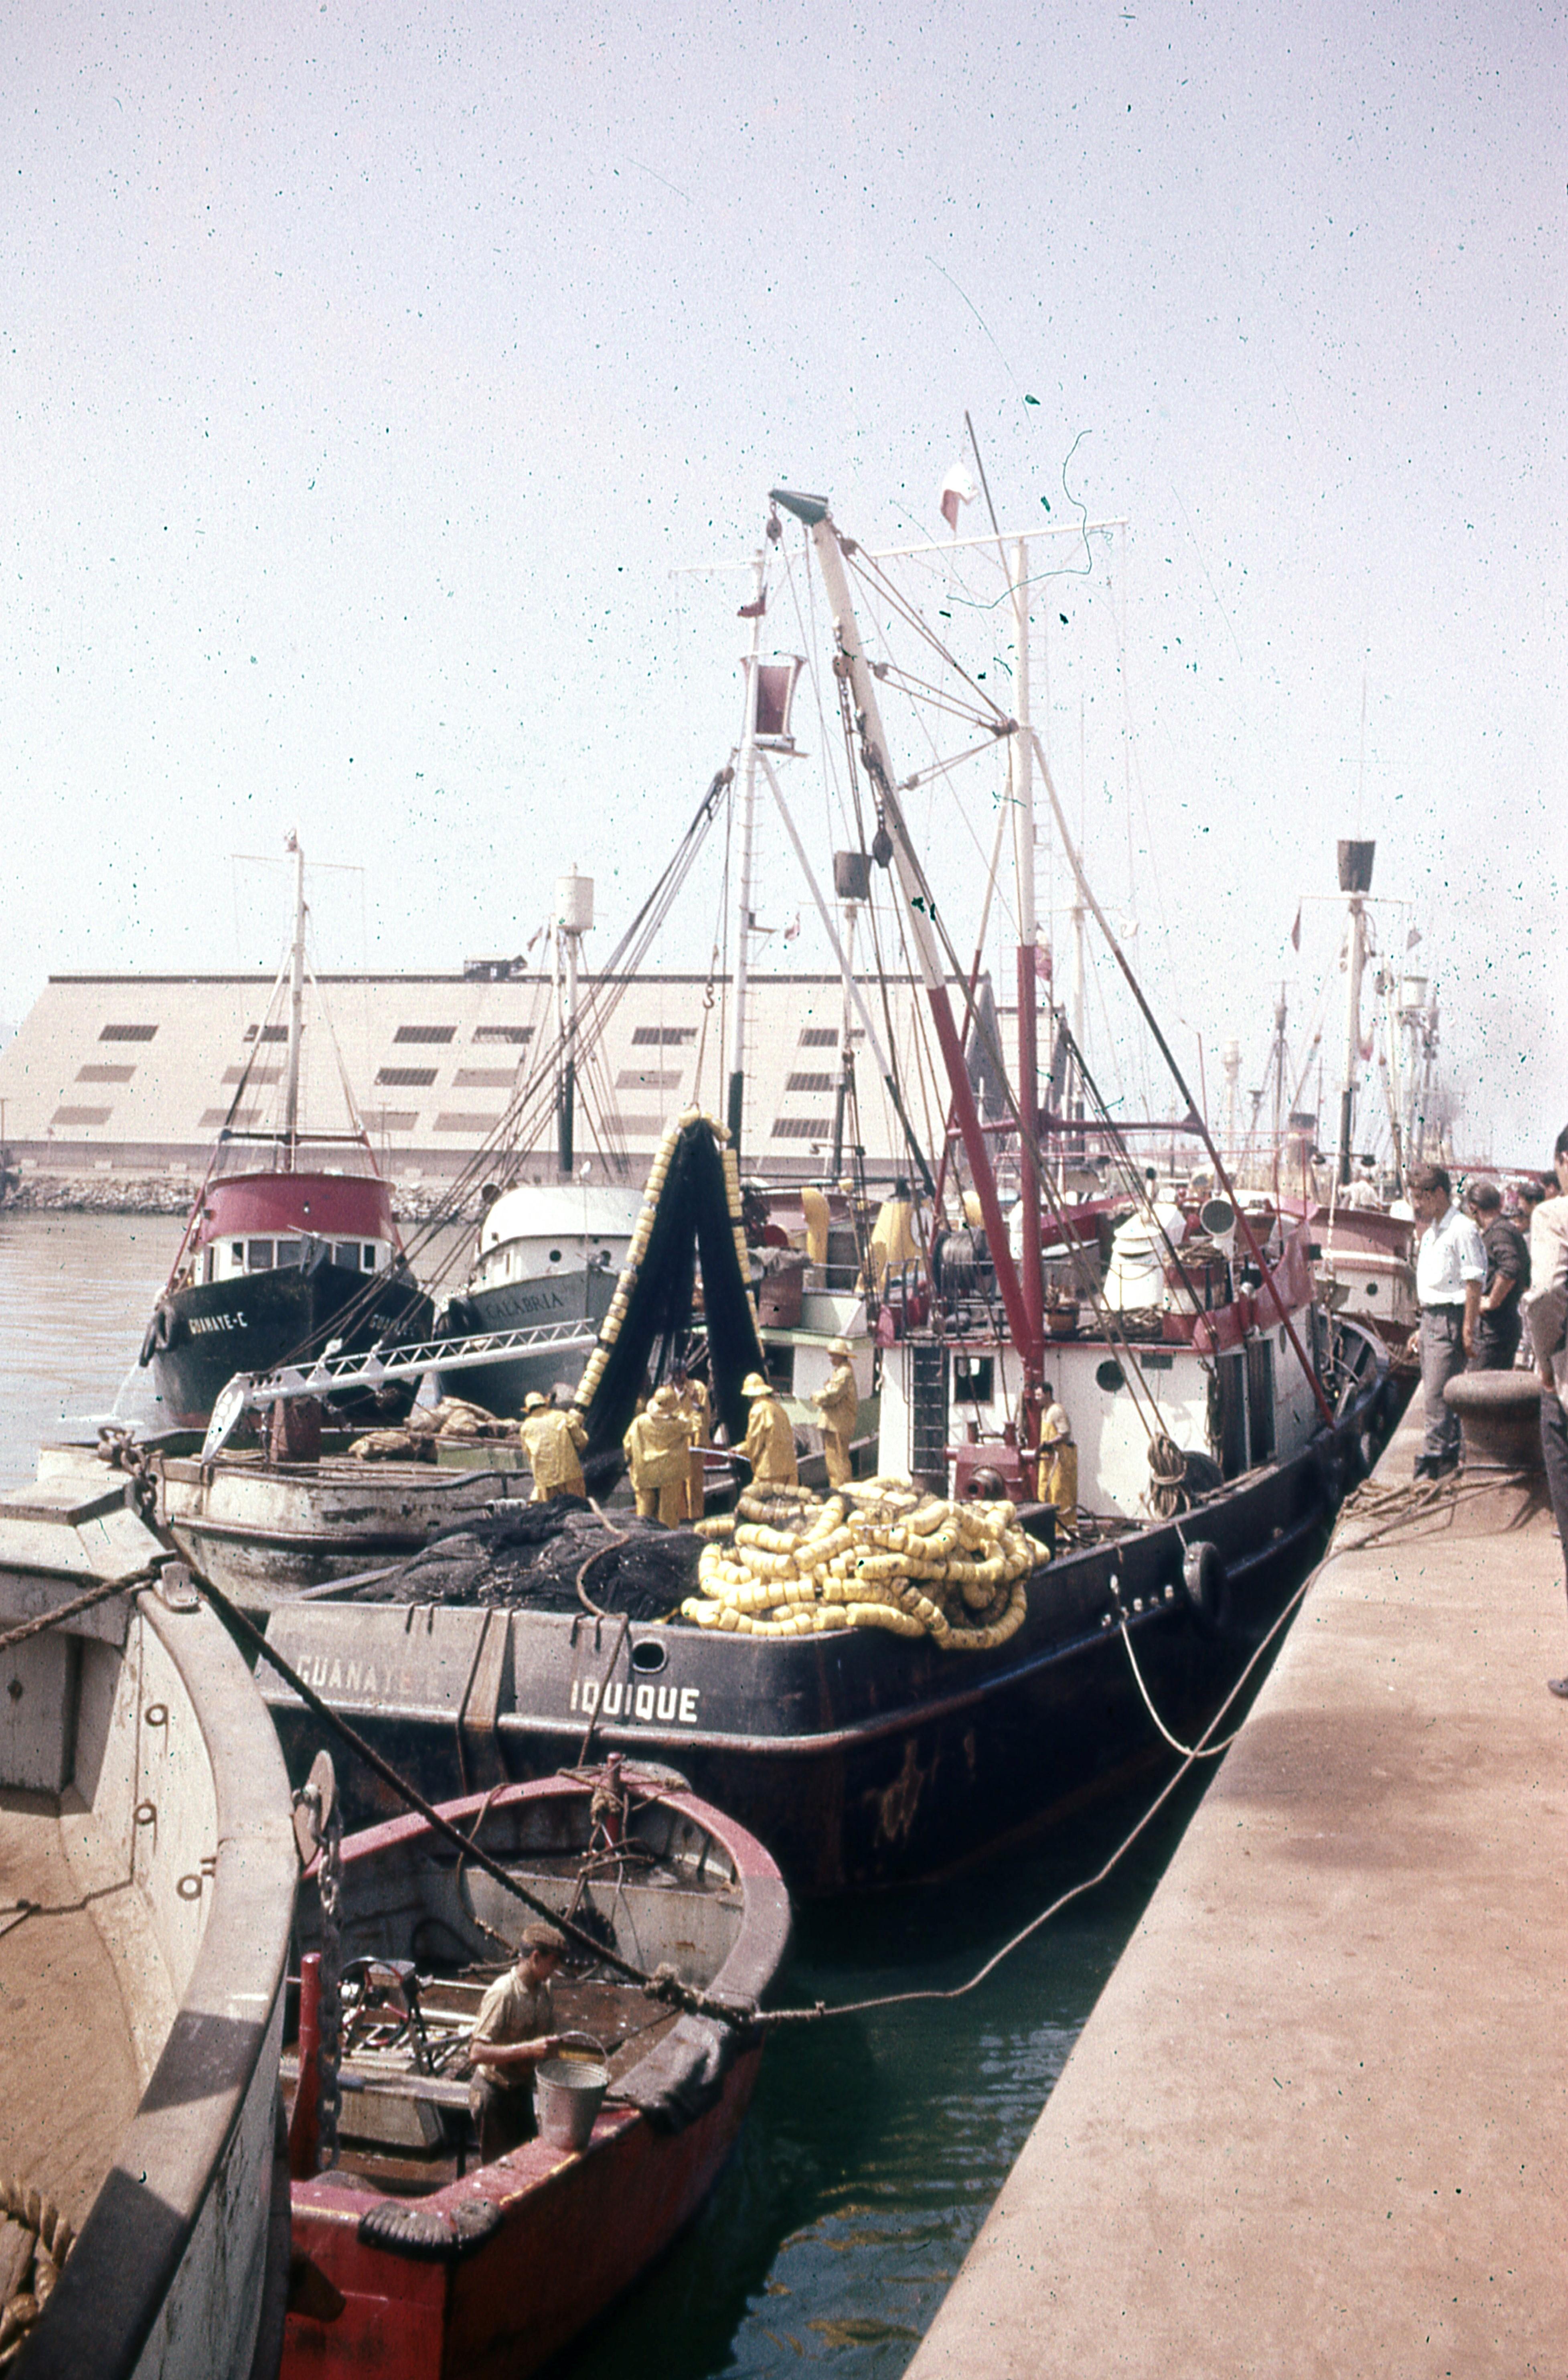 Enterreno - Fotos históricas de chile - fotos antiguas de Chile - Goletas de Iquique, 1977